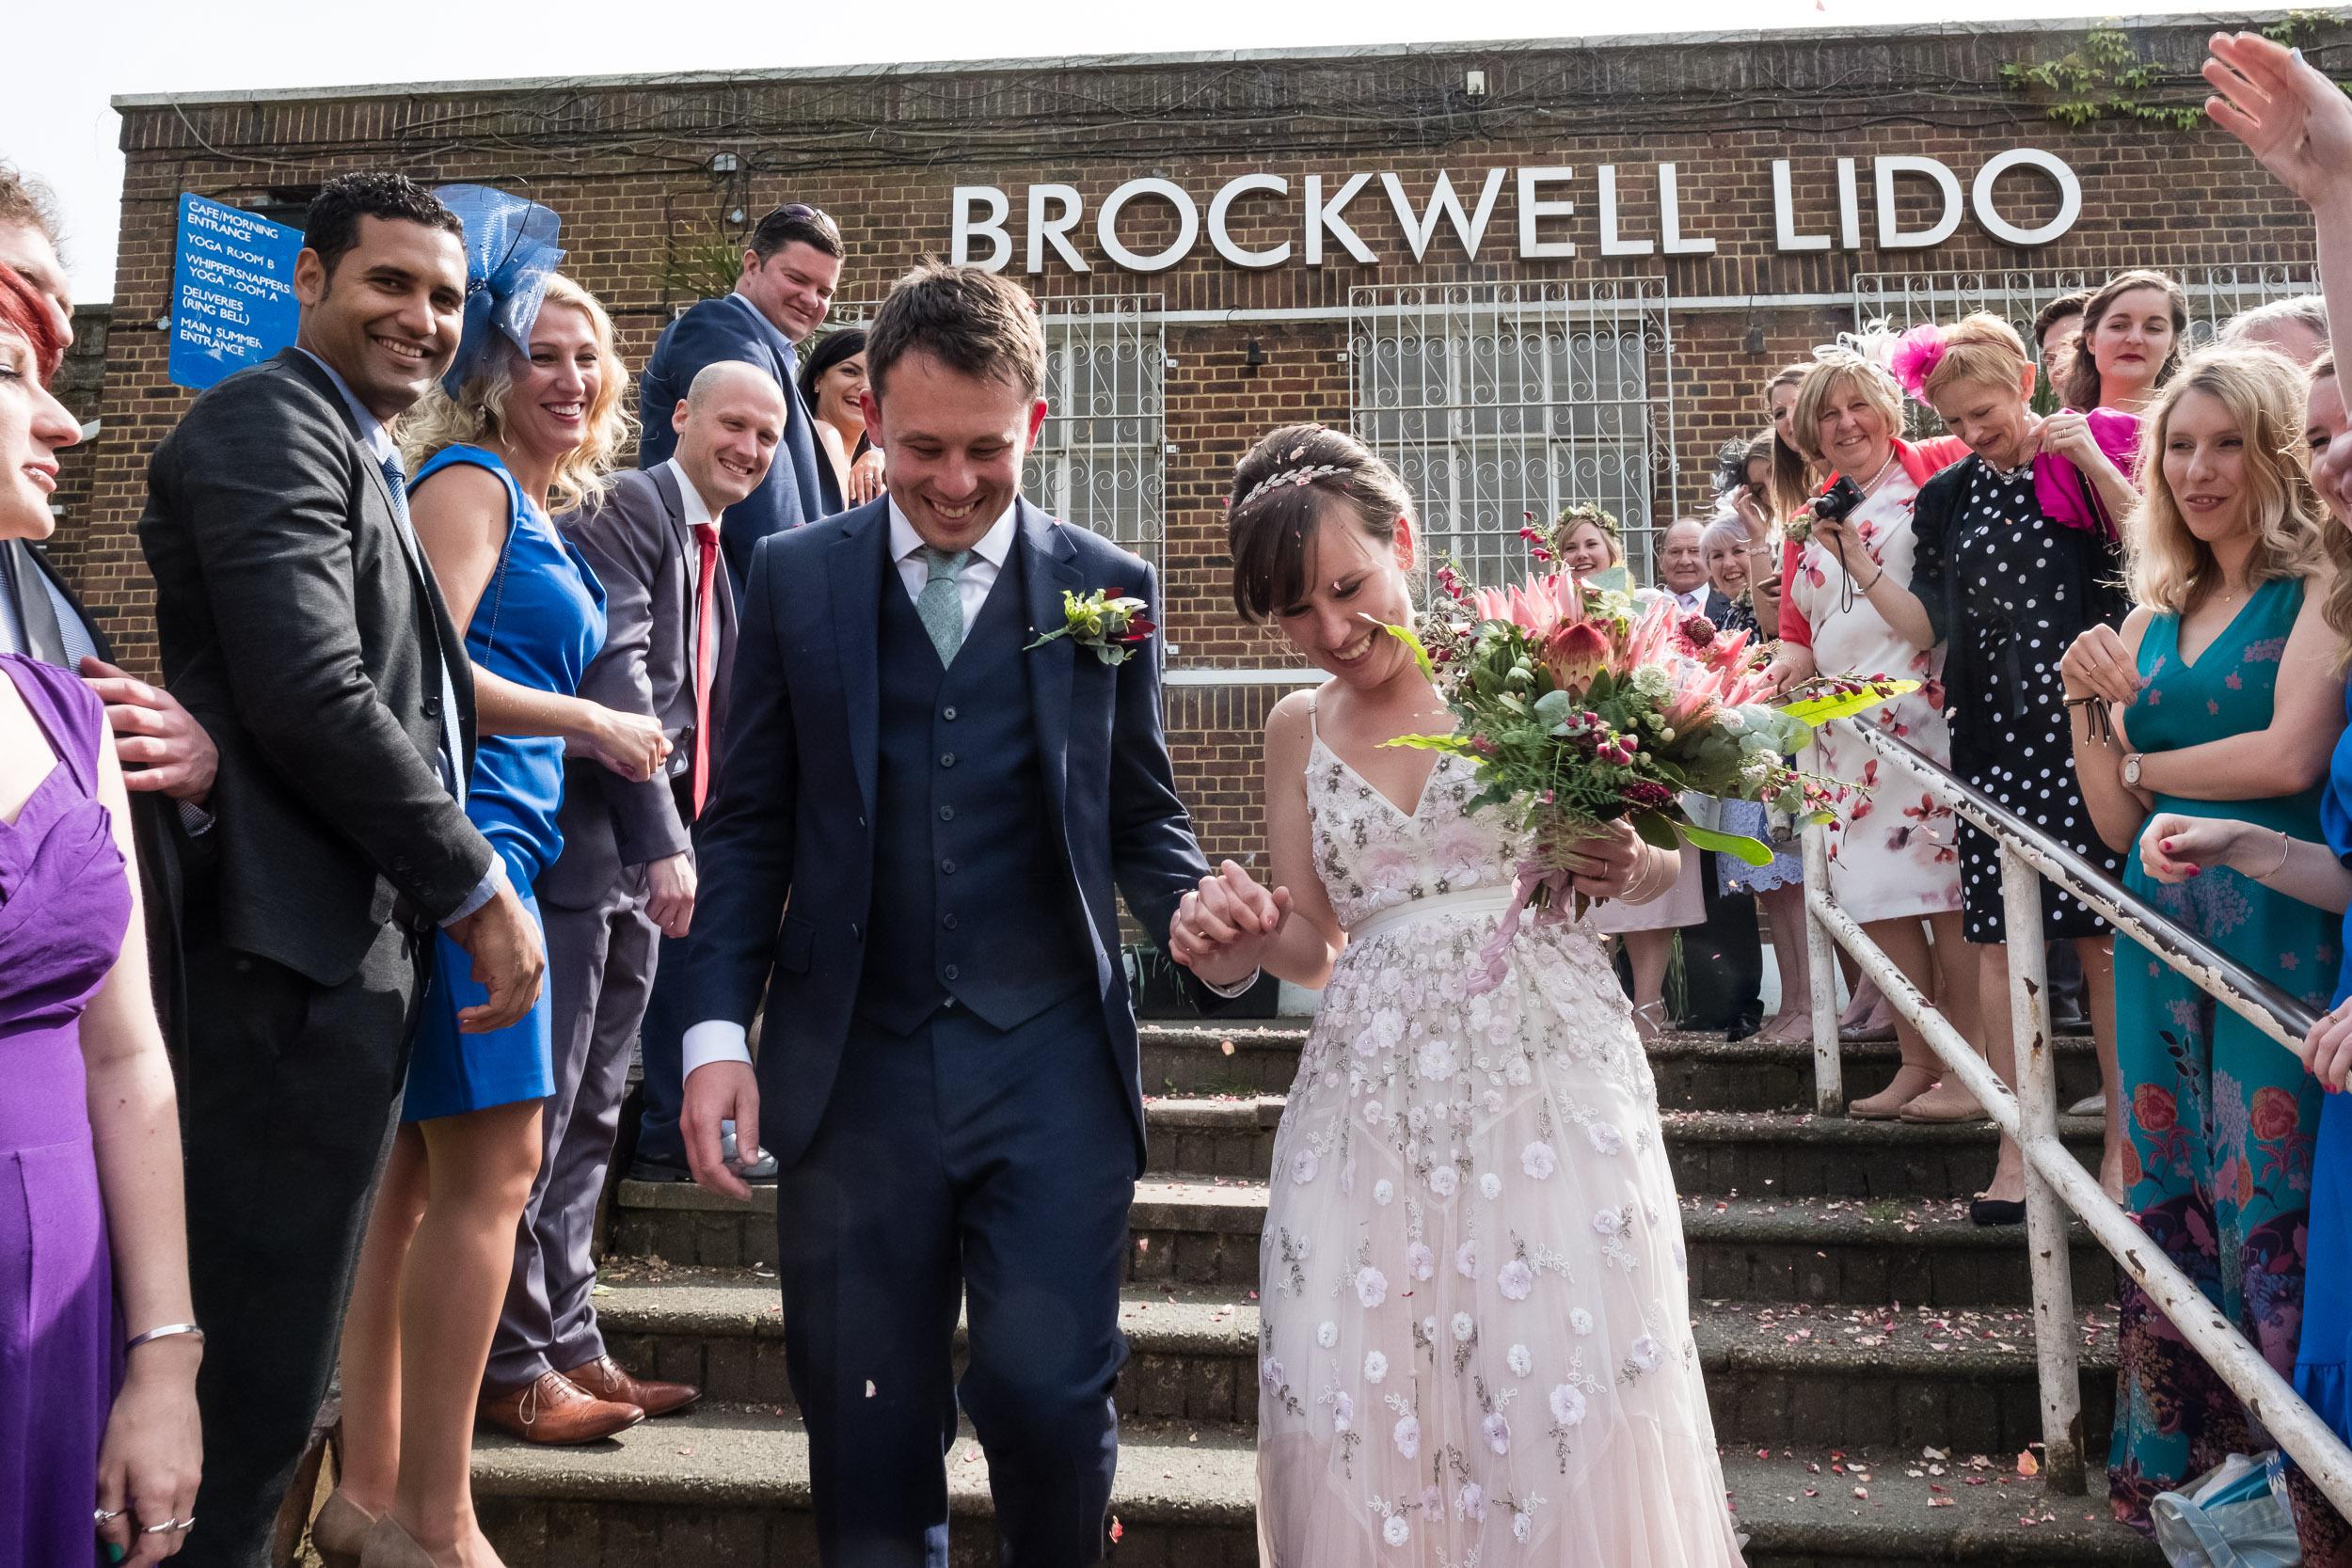 brockwell-lido-brixton-herne-hill-wedding-212.jpg